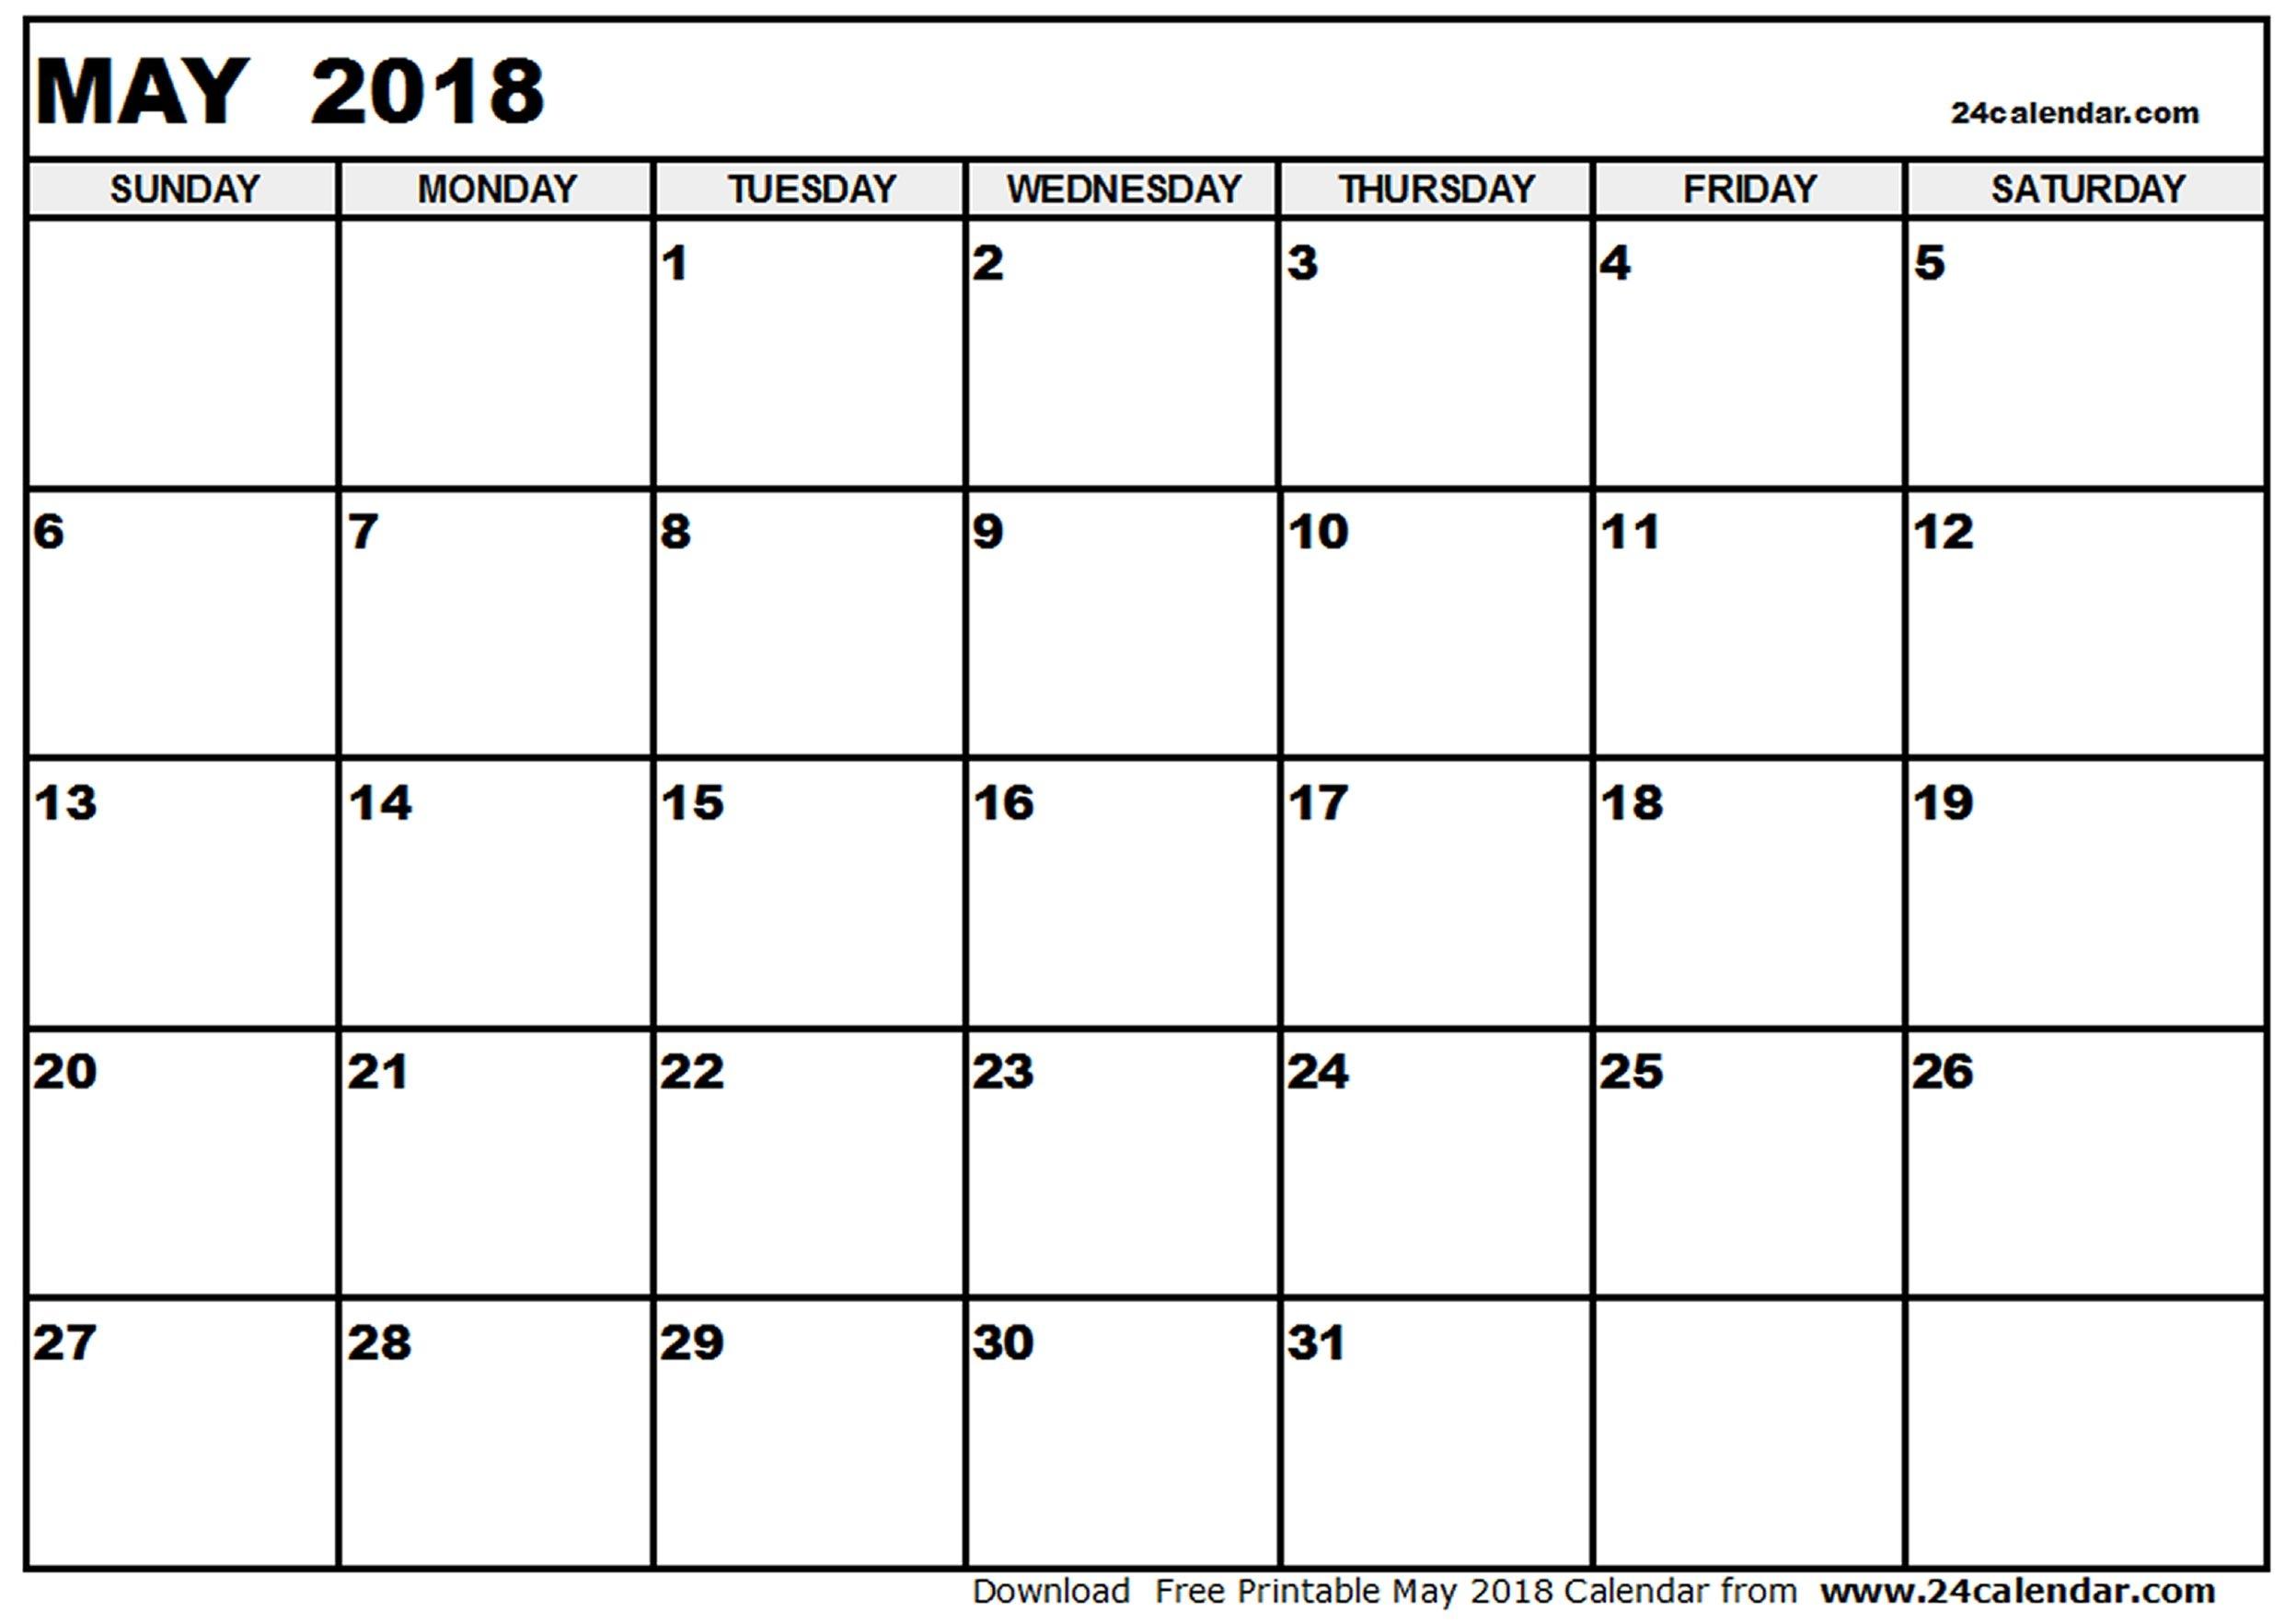 May 2018 PDF Calendar